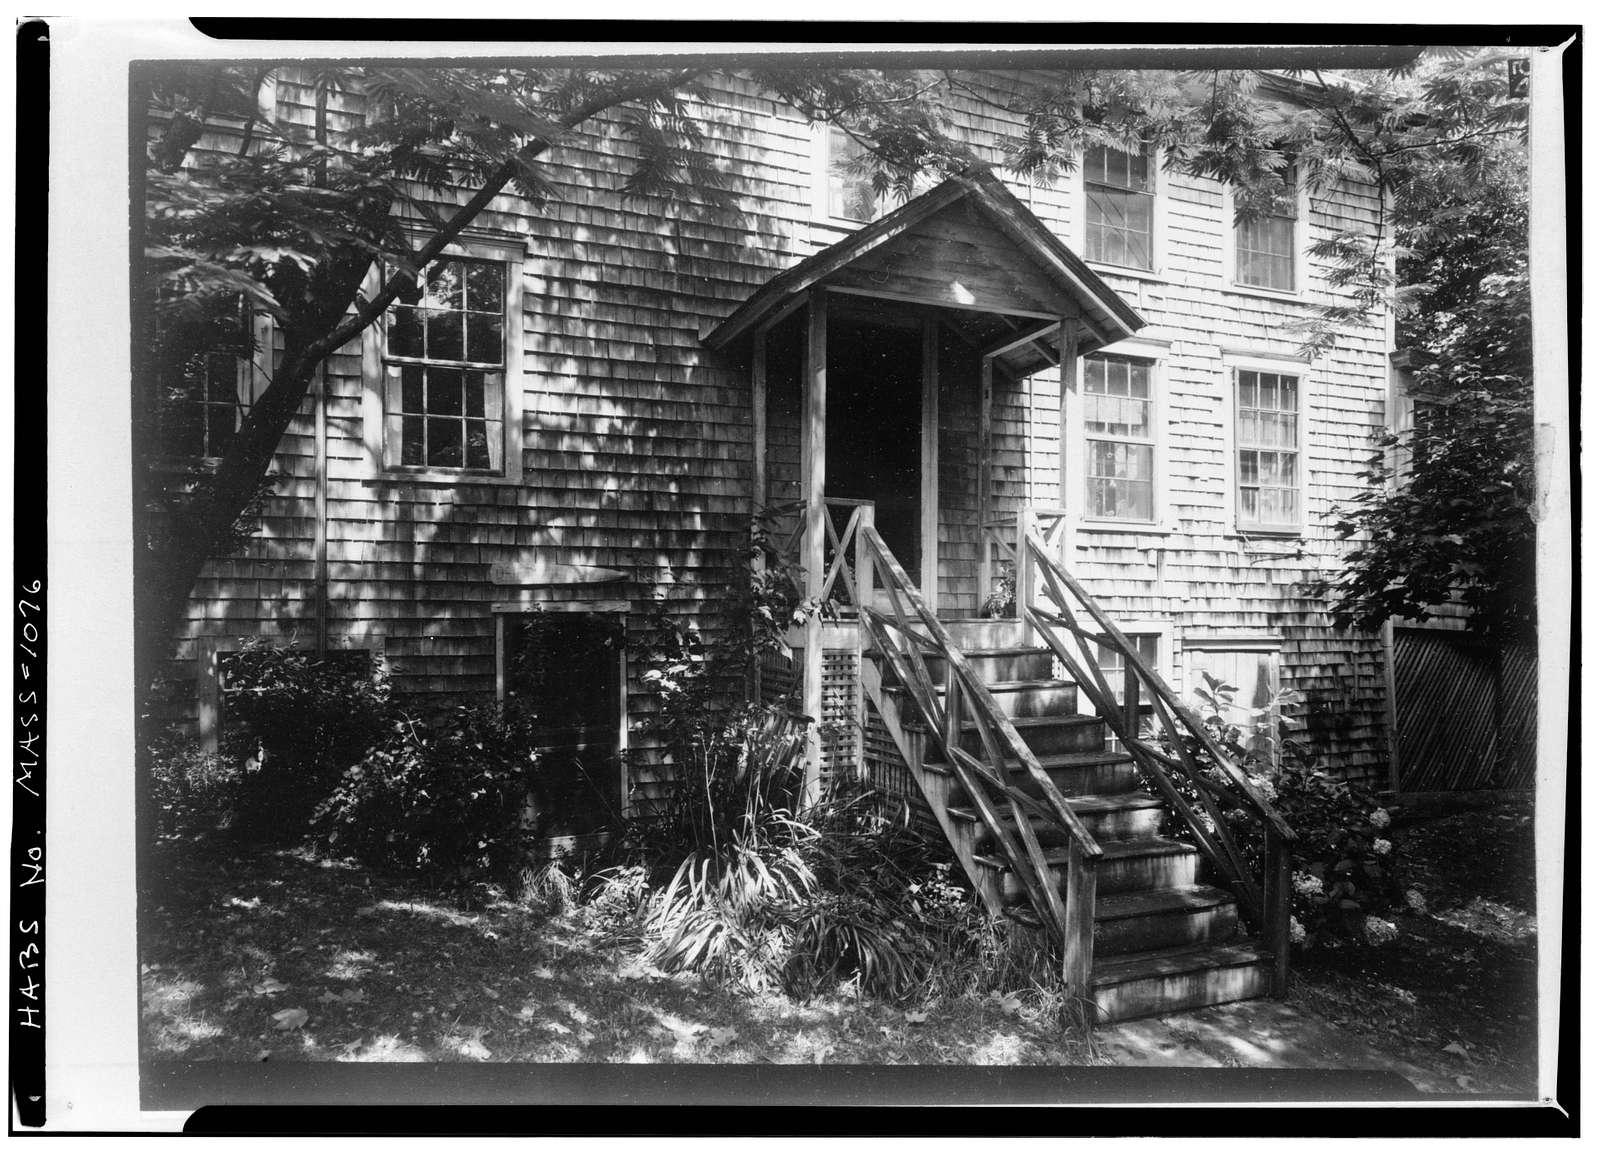 Solomon & Paul Gardner Houses, 1 & 3 Stone Alley, Nantucket, Nantucket County, MA